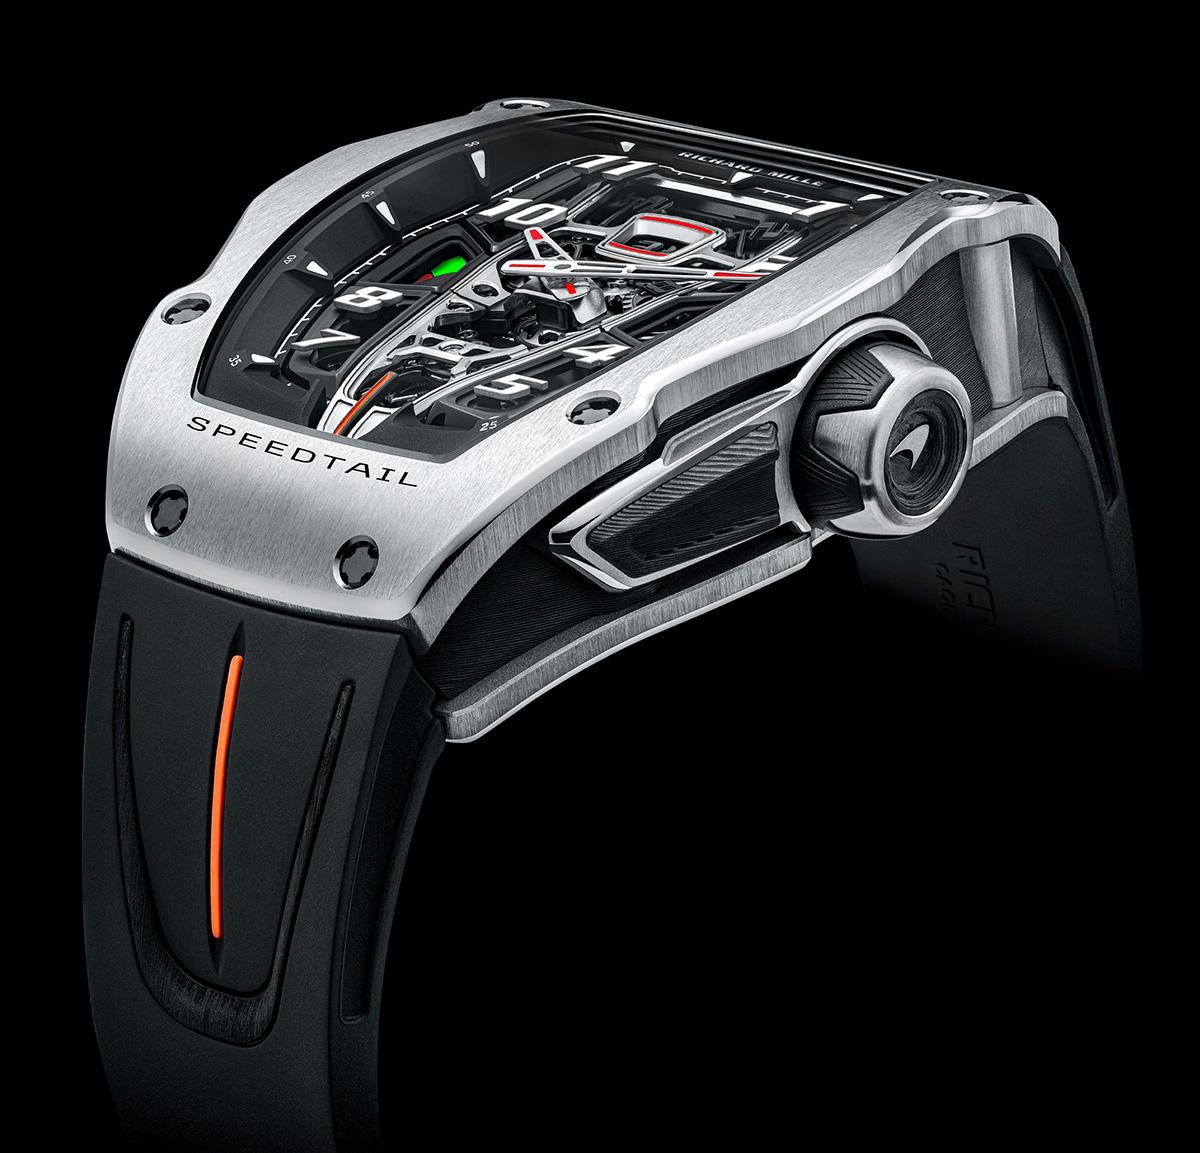 Richard Mille RM 40-01 McLaren Speedtail